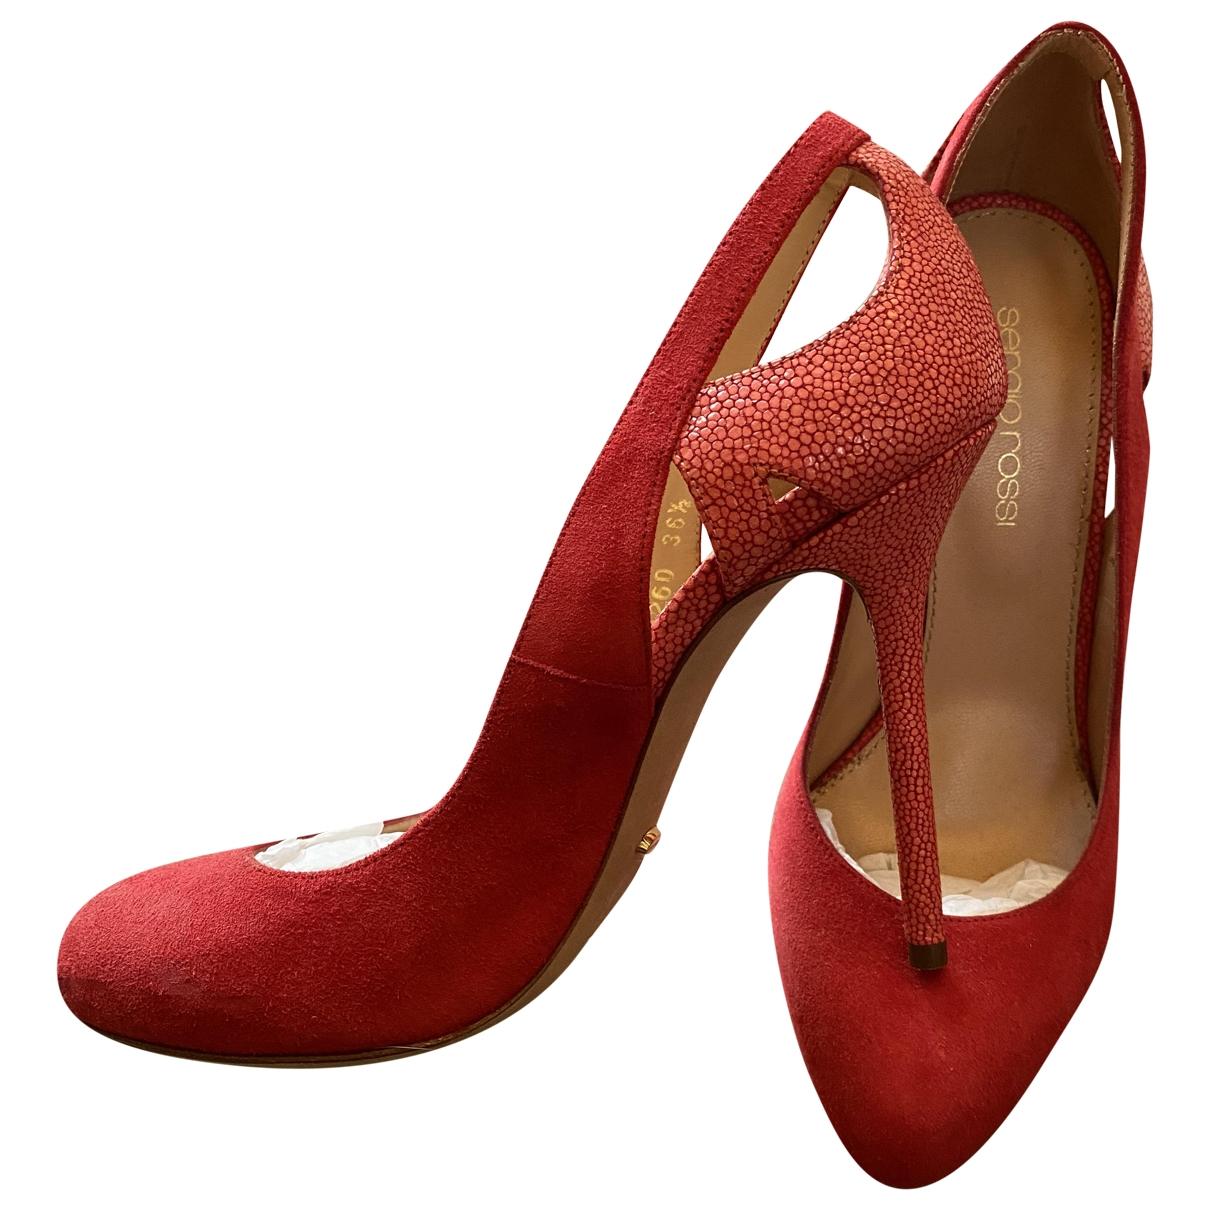 Sergio Rossi \N Red Suede Heels for Women 36.5 IT